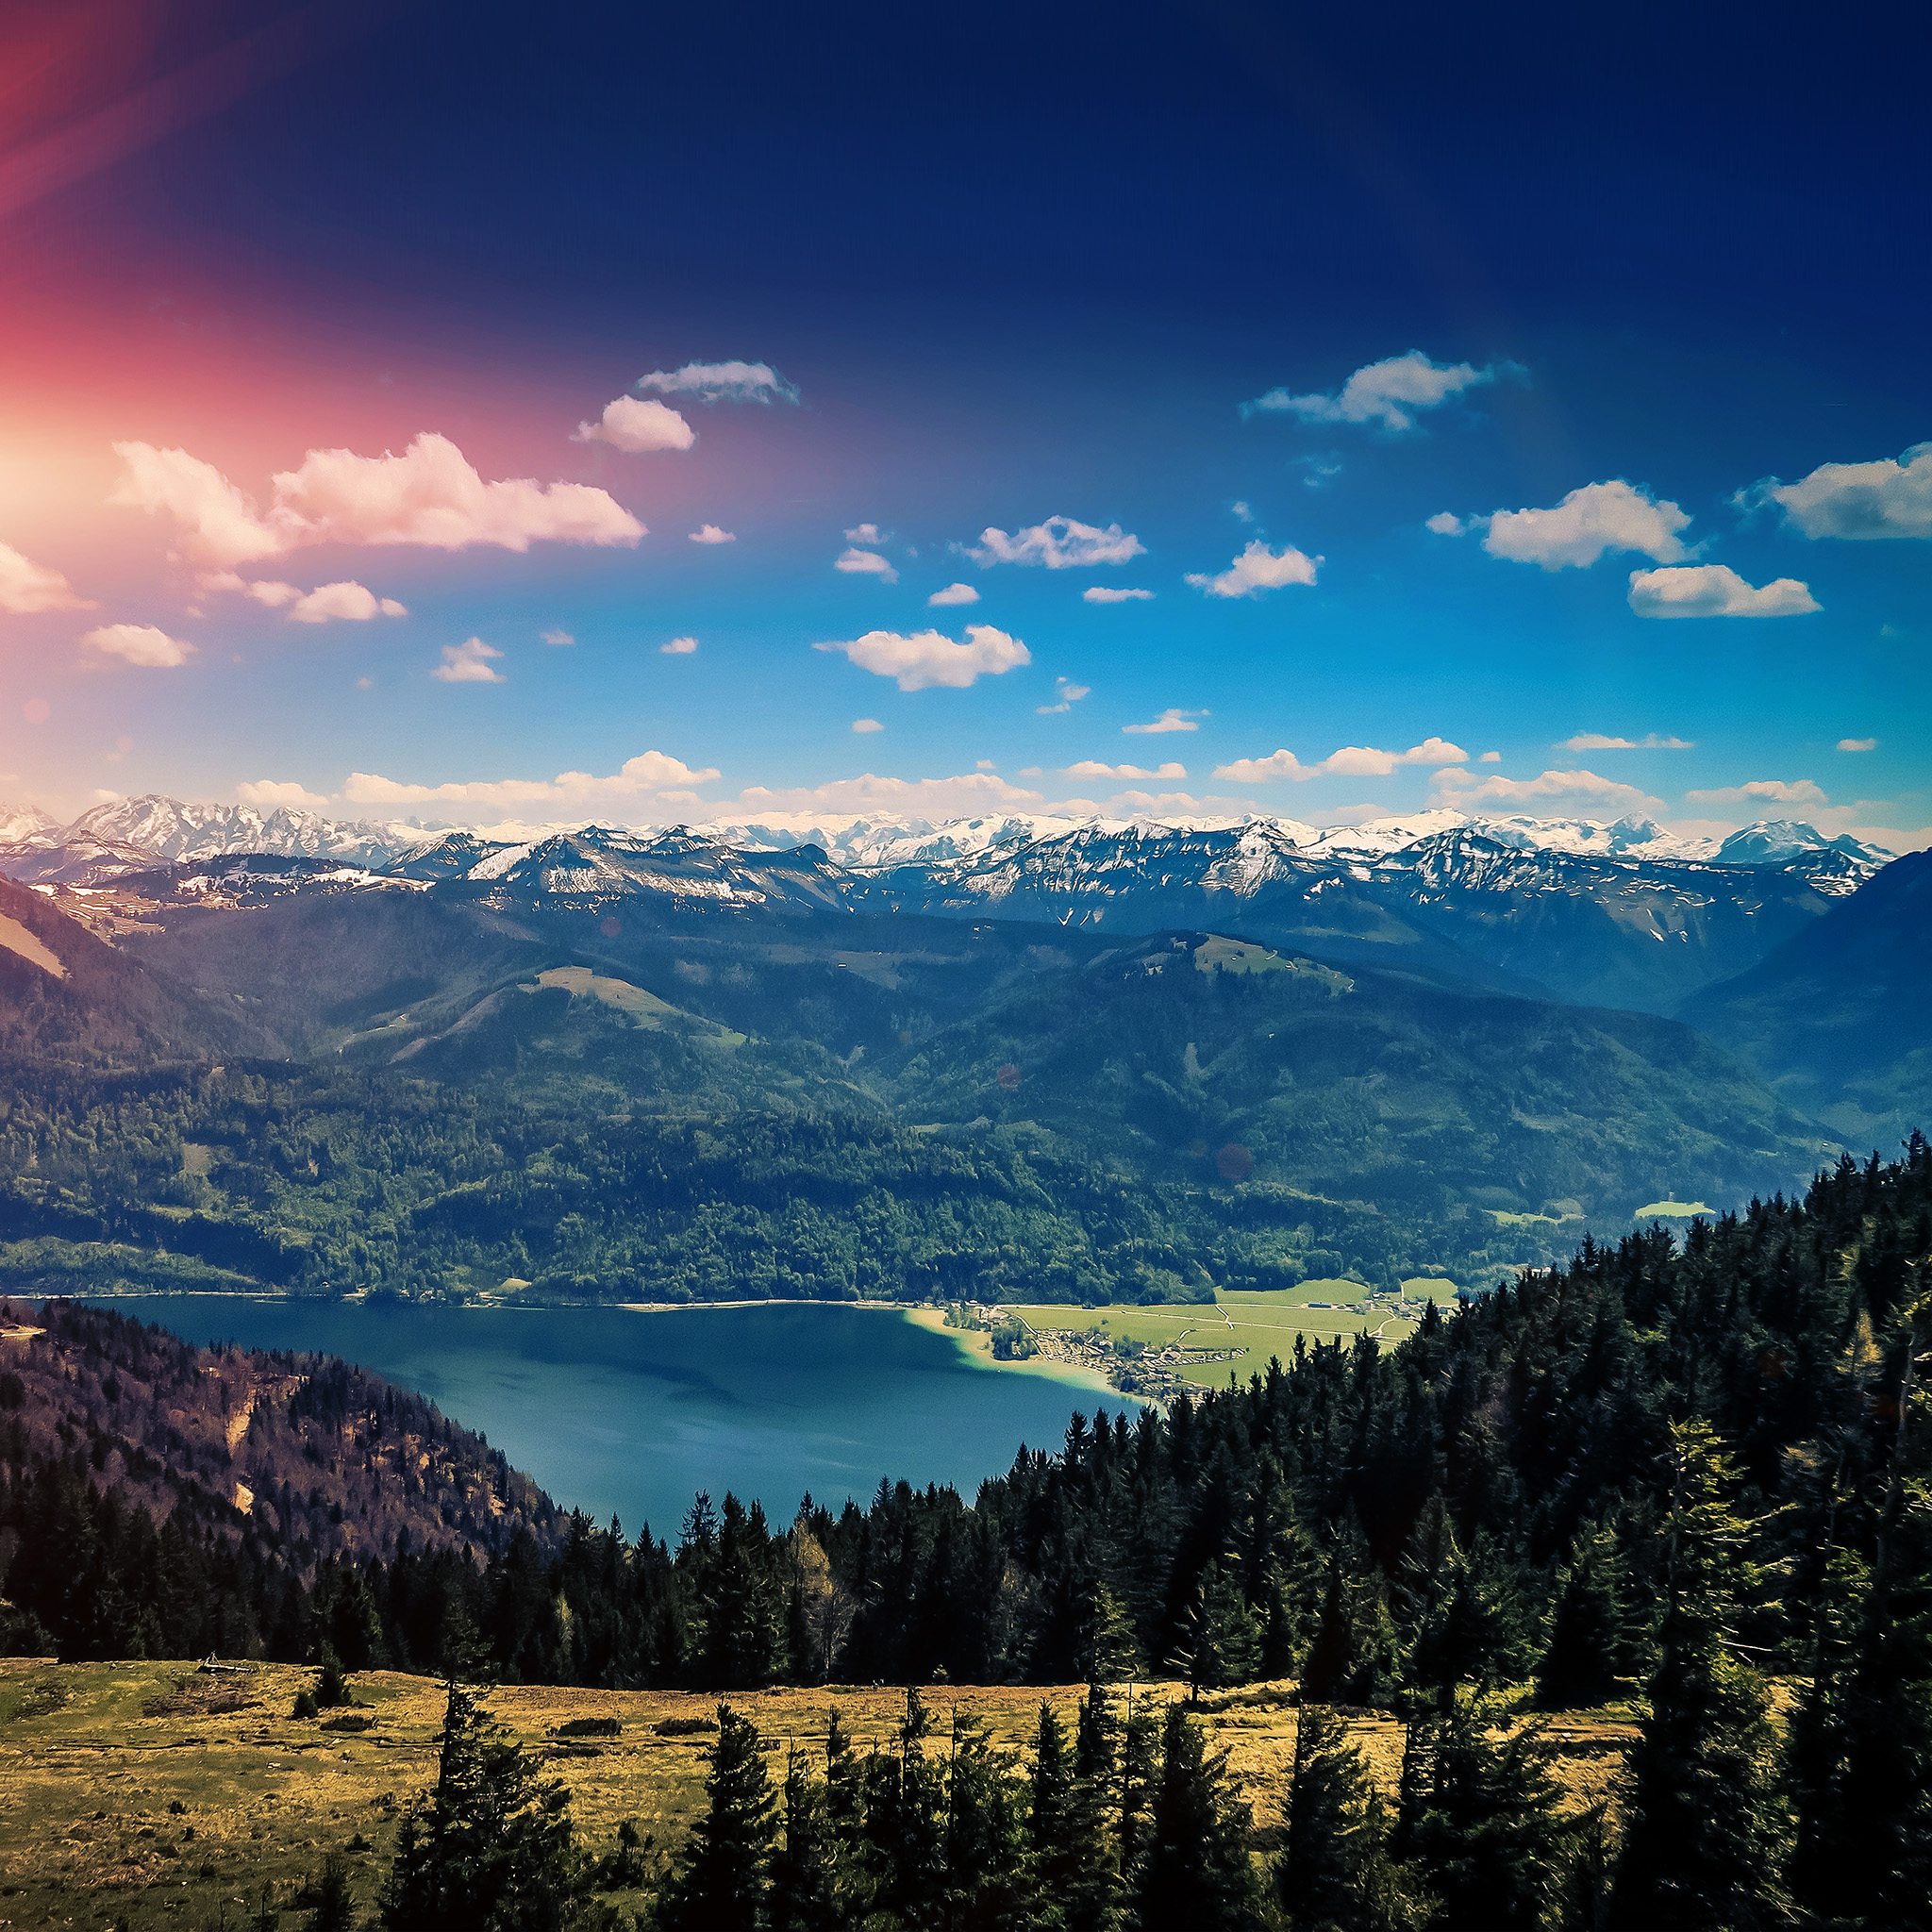 Moto G Plus >> nh94-mountain-sky-river-nature-scenery-summer-dark-wallpaper